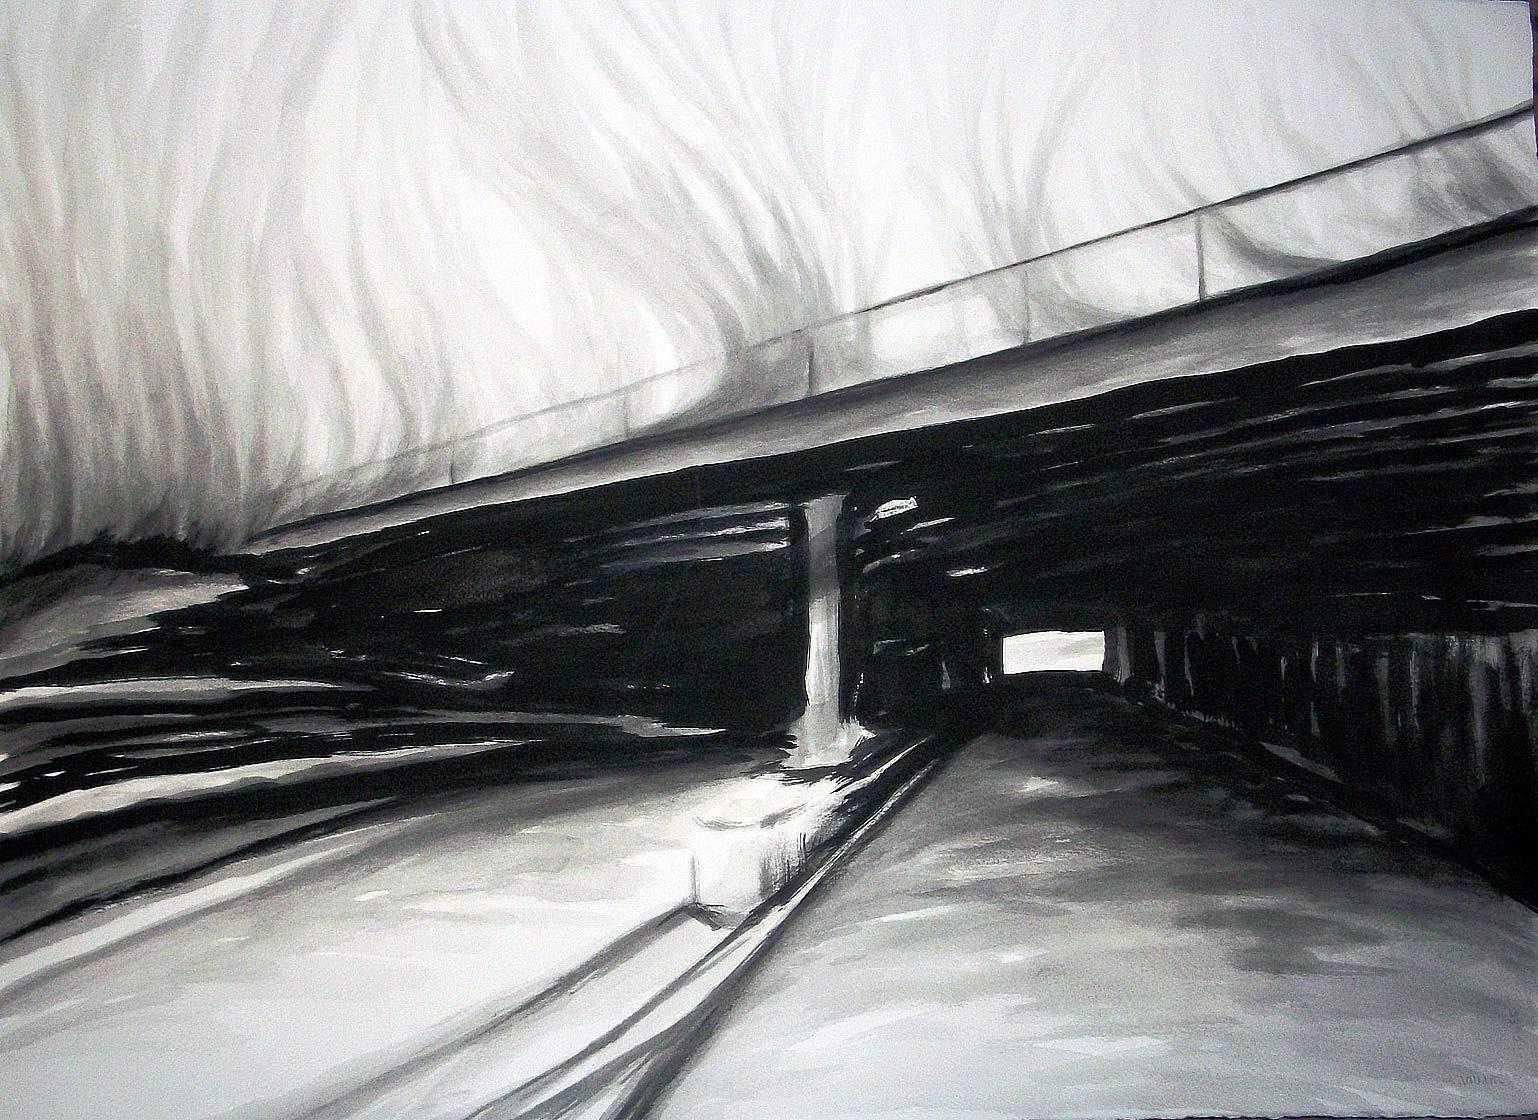 train bridge, viaduct, pen and ink, watercolor wash, watercolor ink